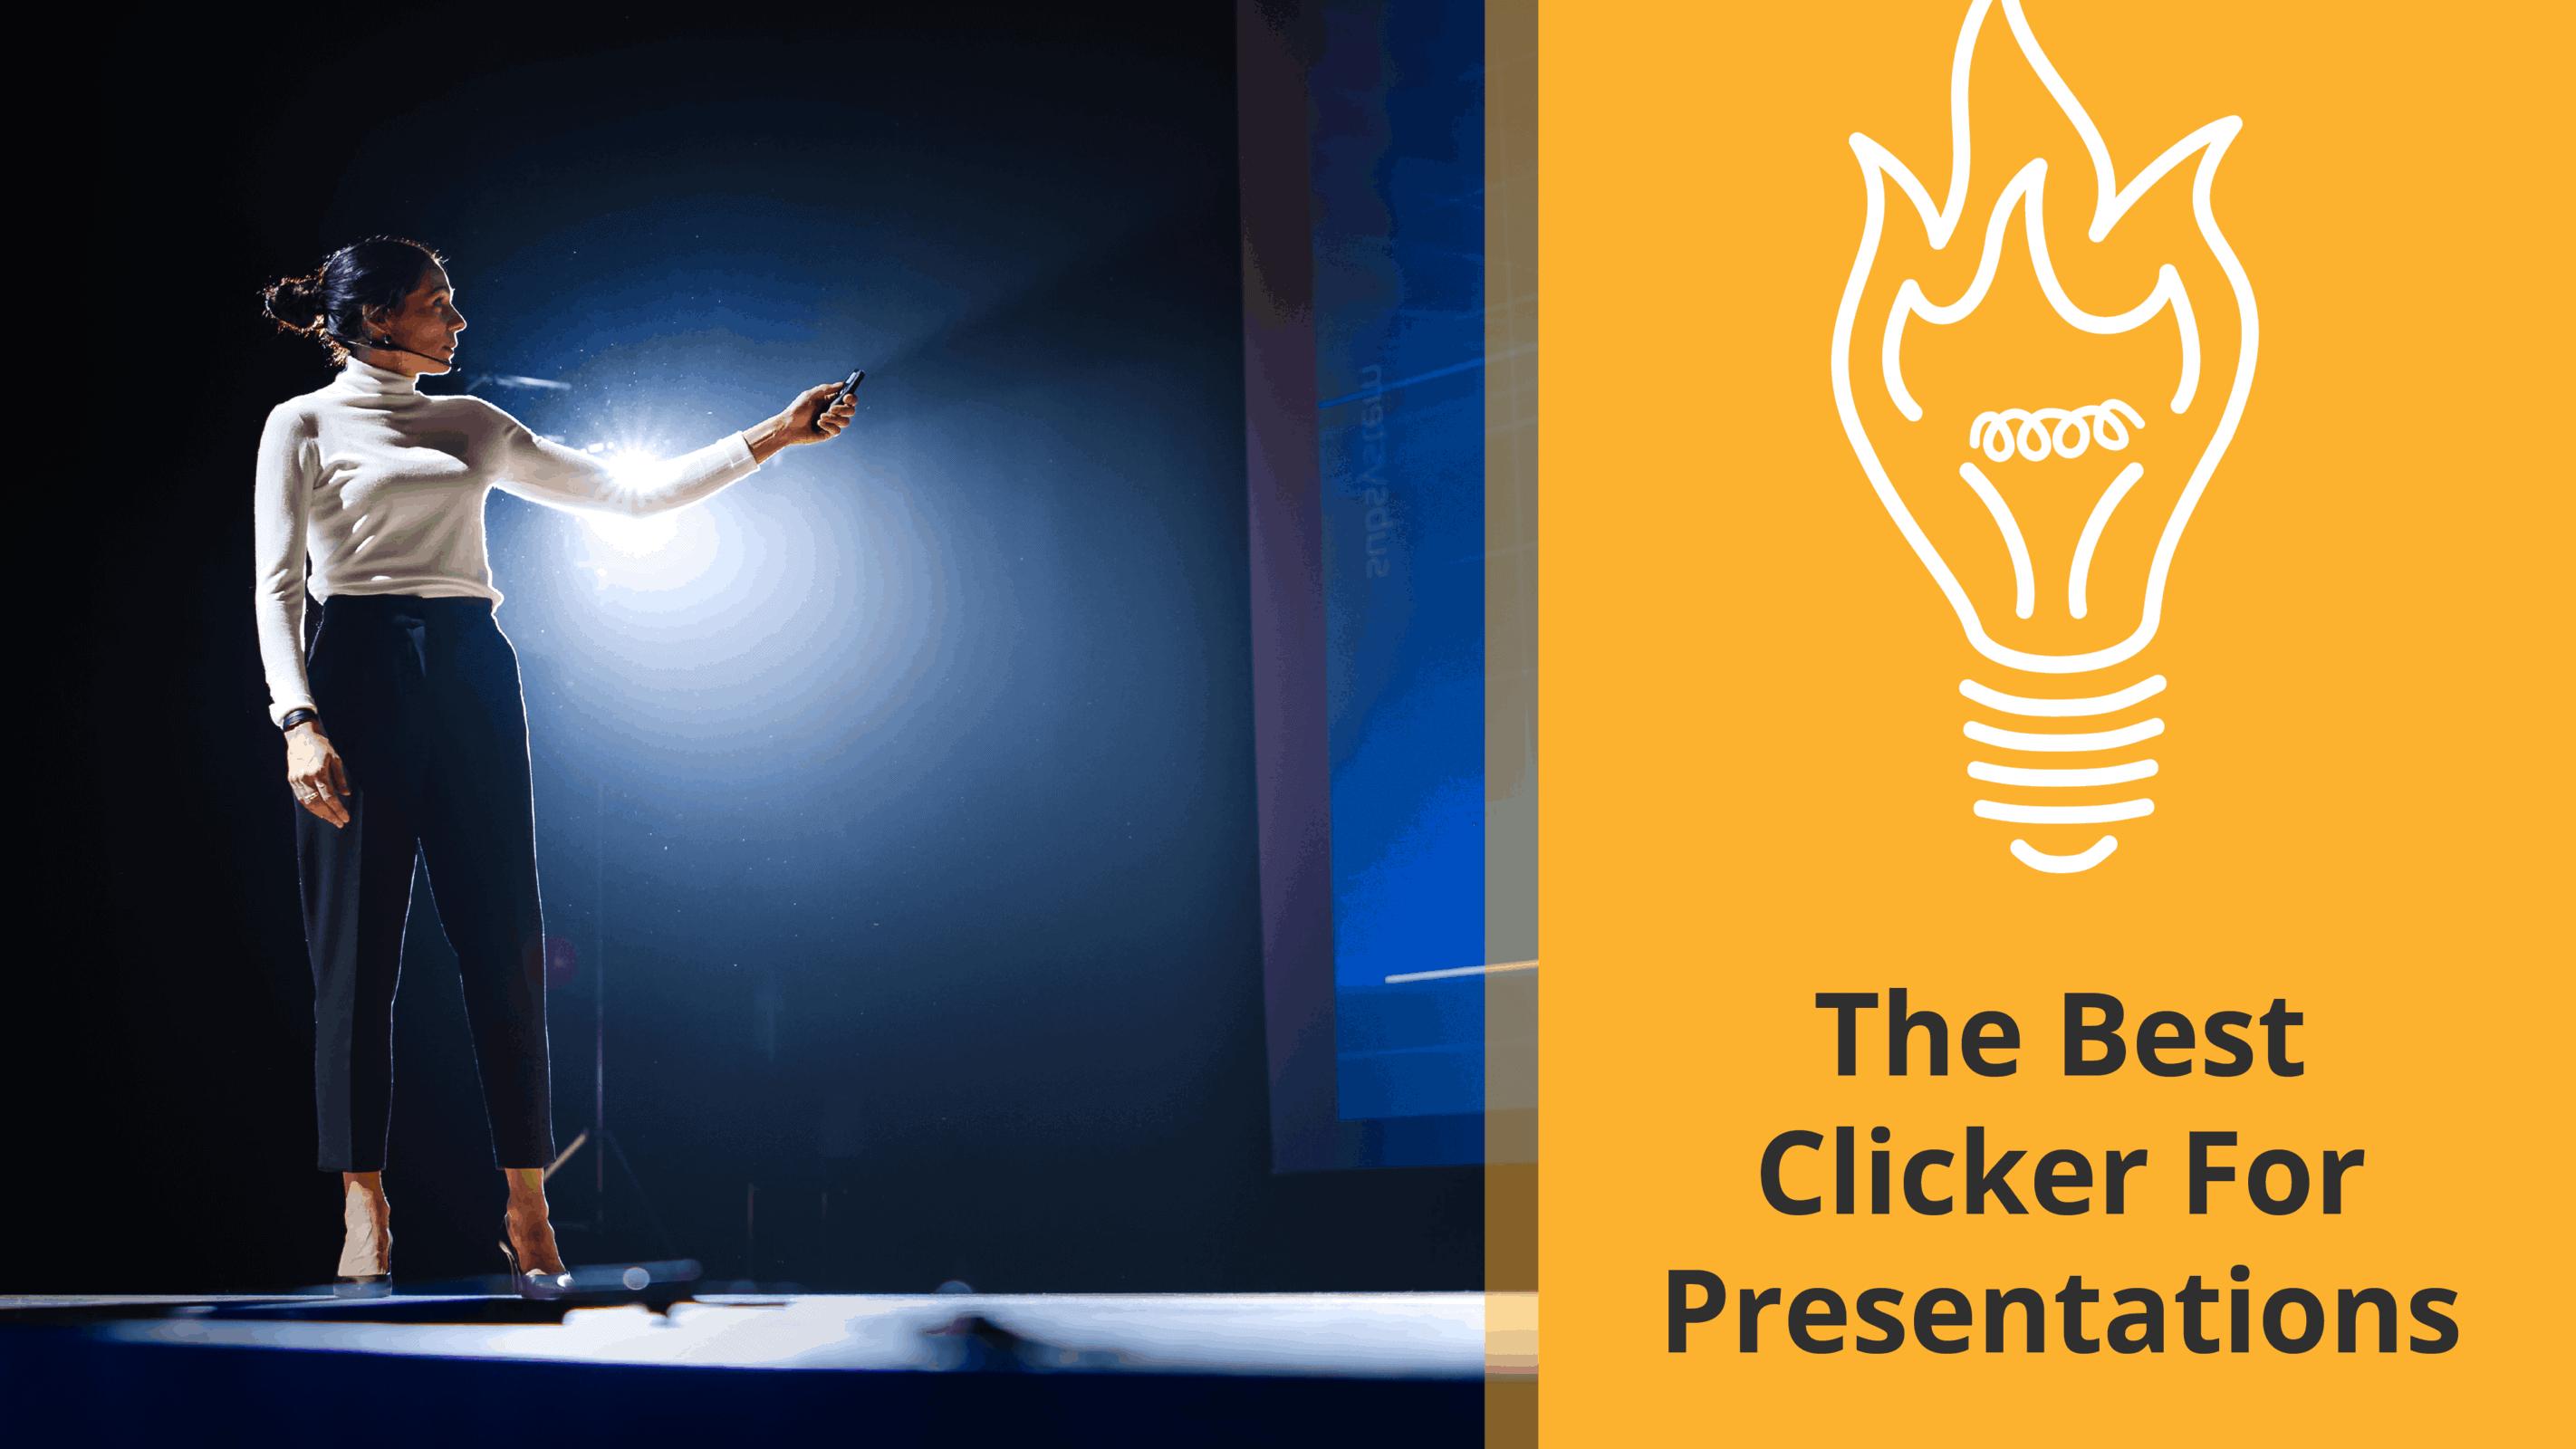 presentation clicker recommendations